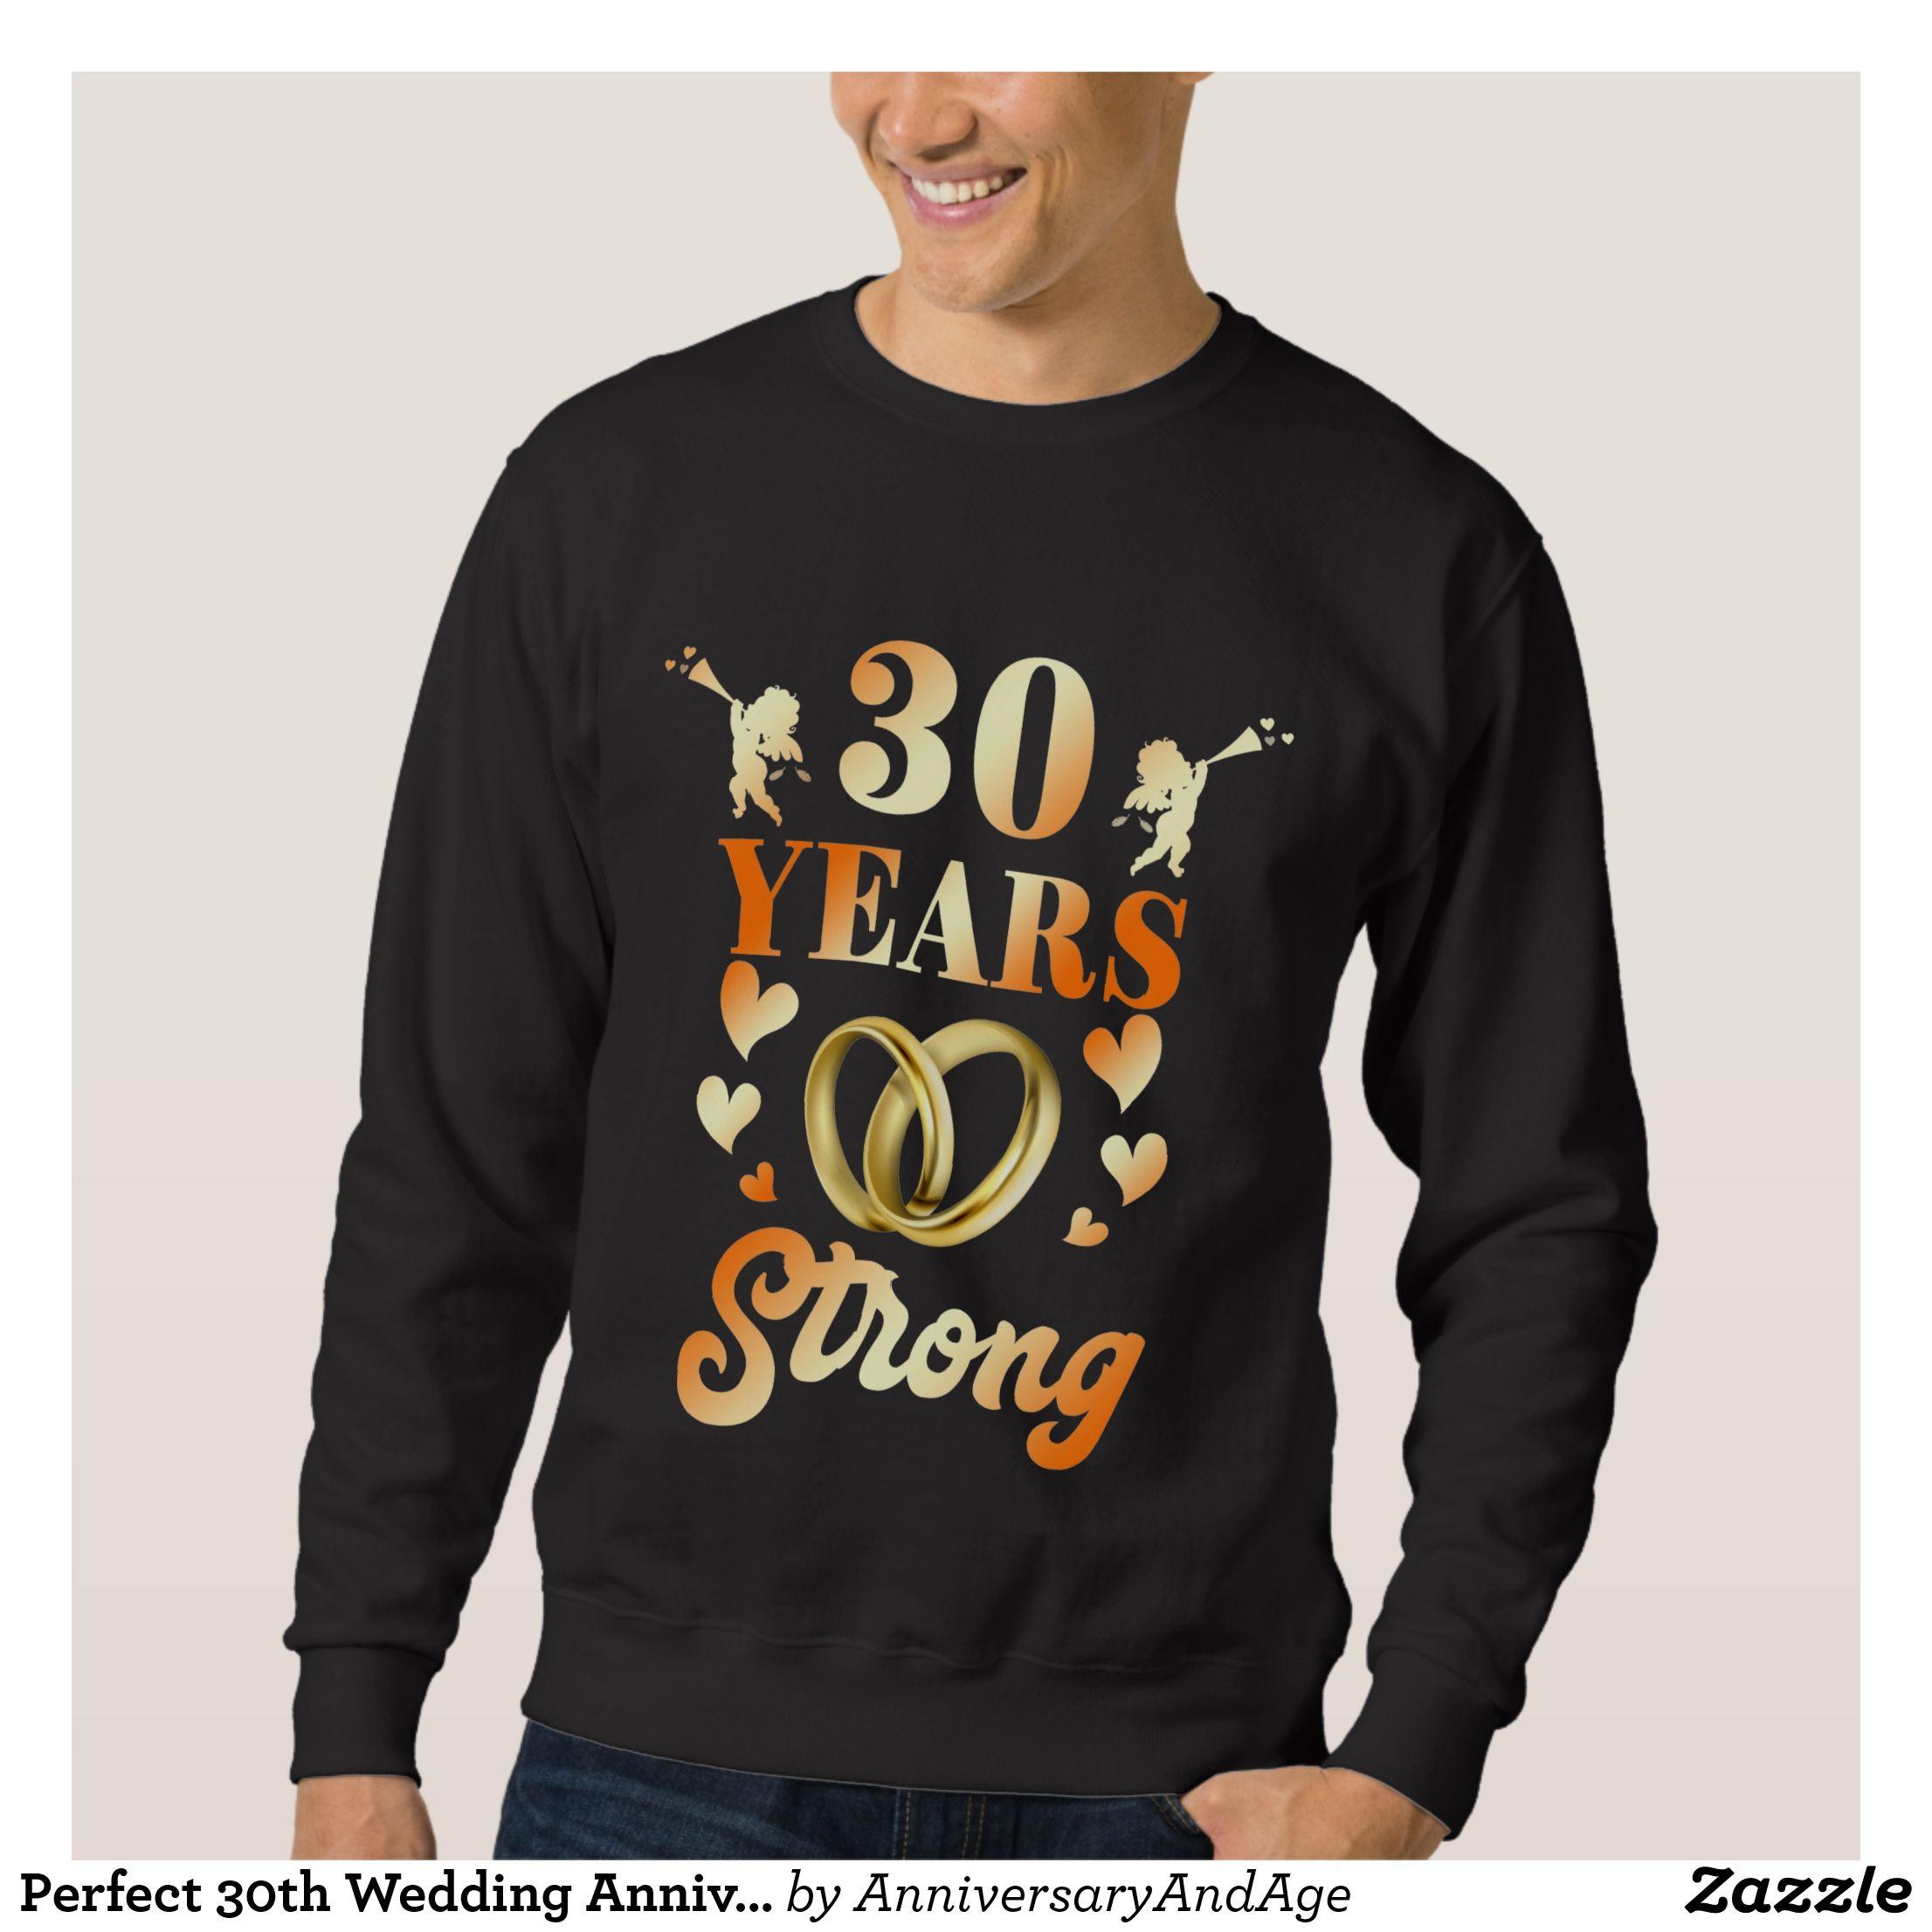 Perfect 30th Wedding Anniversary Gift For Couple Sweatshirt